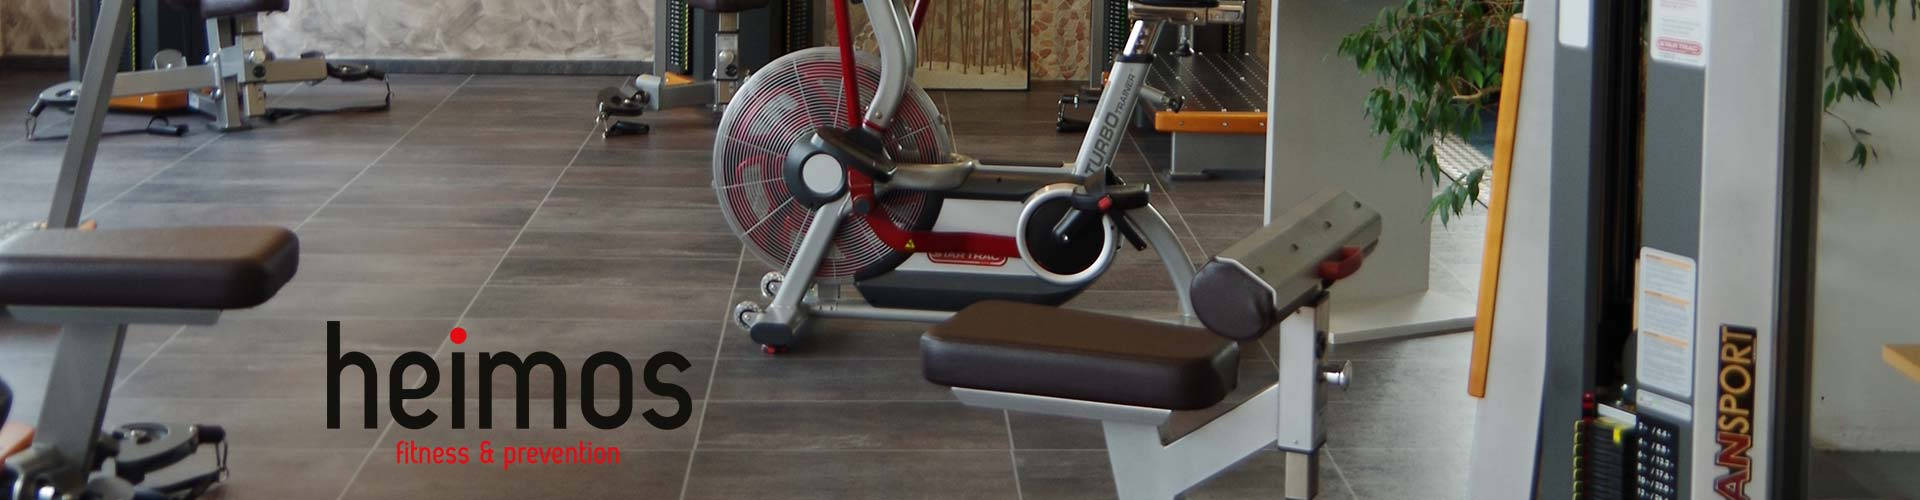 Krankheitsdiagnostik in Passau im Fitnessstudio heimos fitness